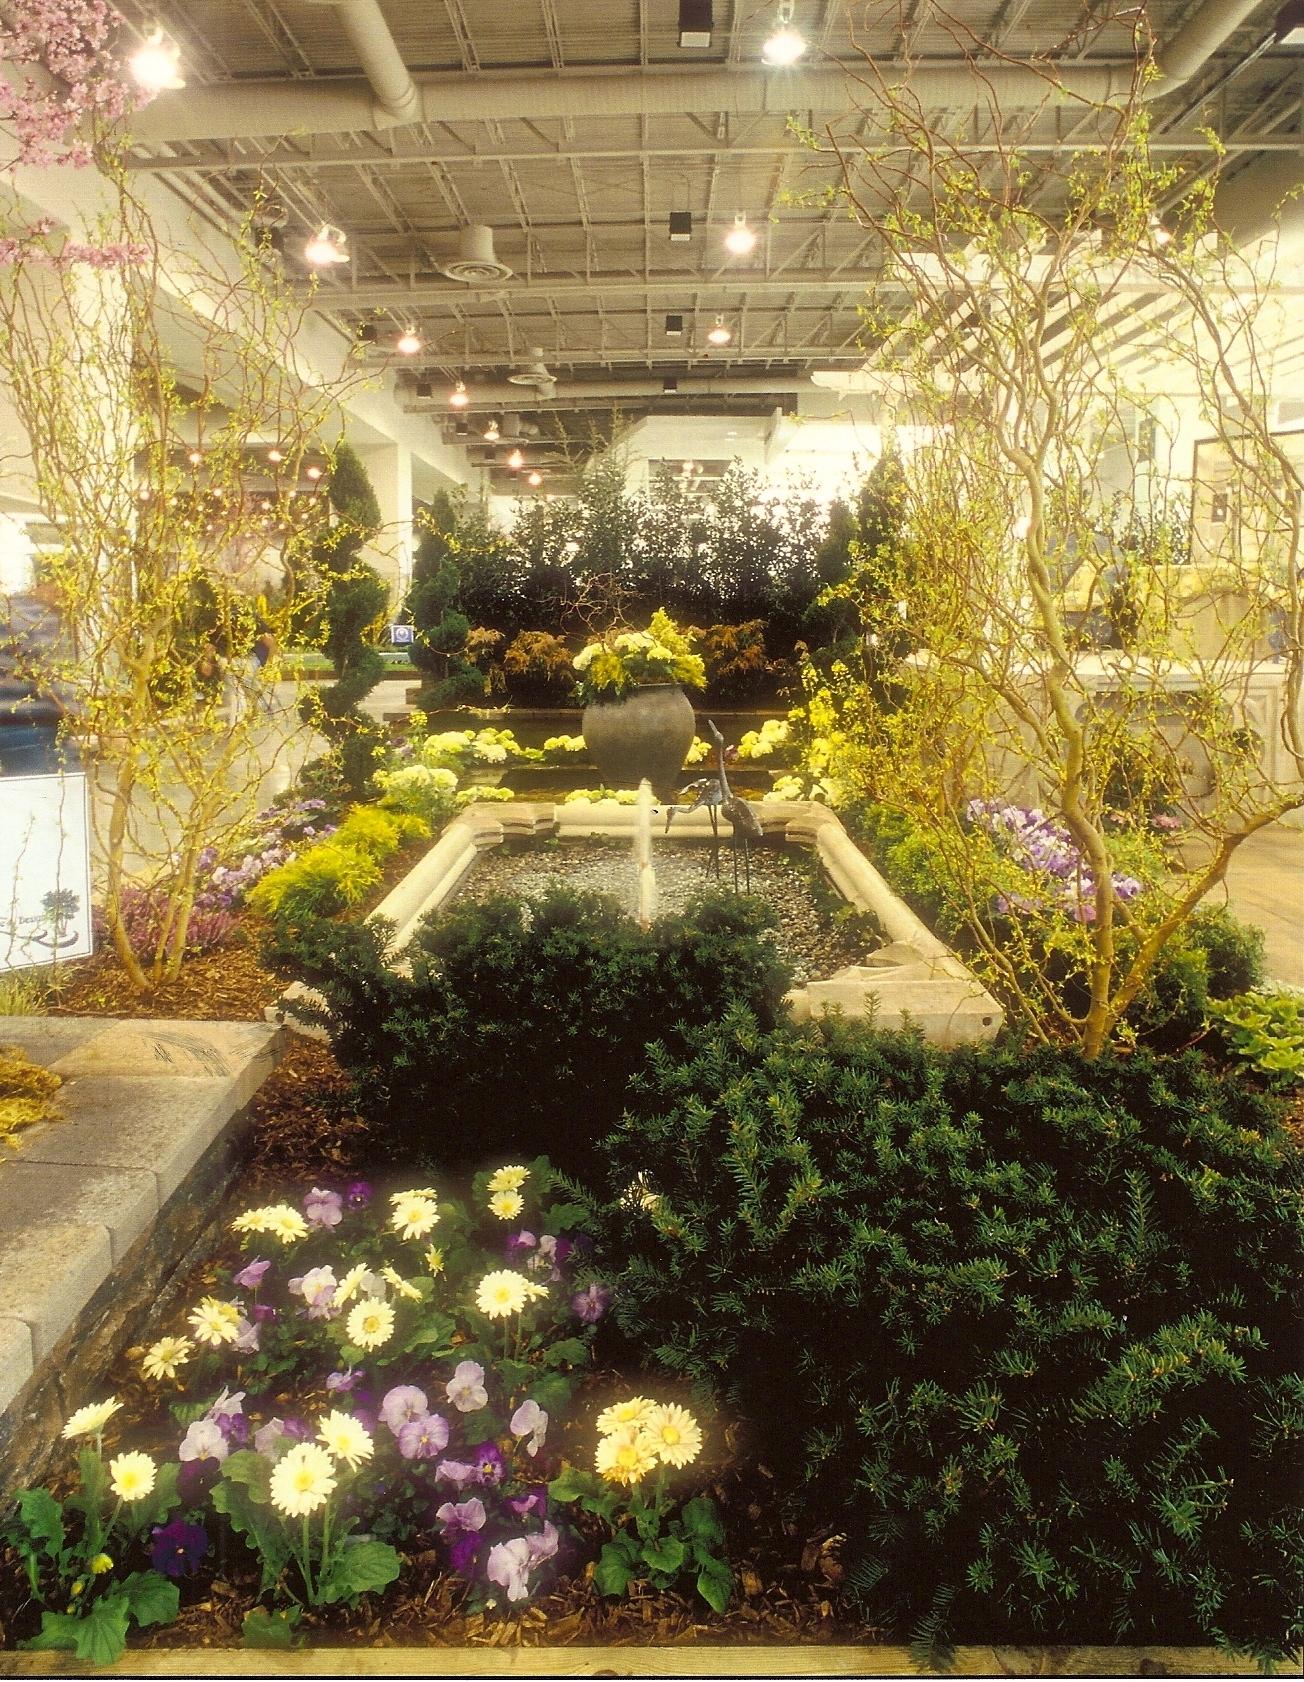 Washington Flower and Garden Show, Excellence in Design